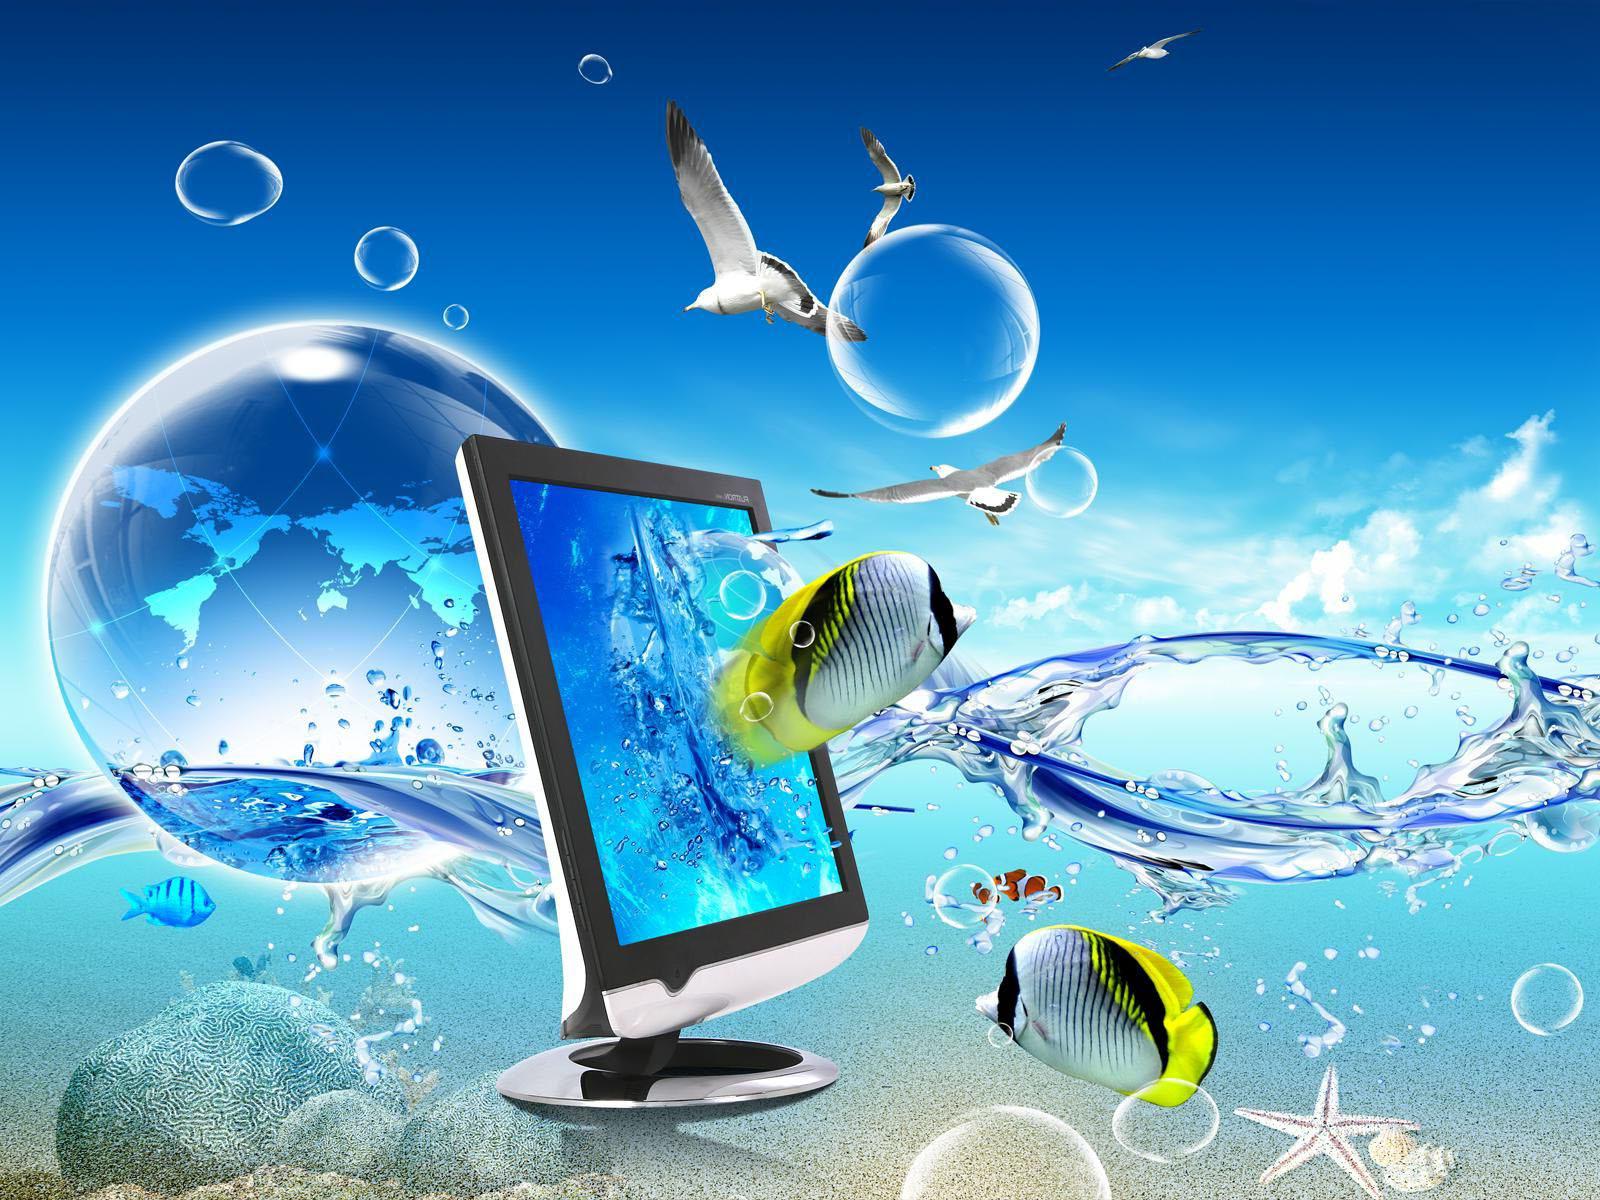 Best desktop hd wallpaper pc desktop wallpaper for Desktop images hd